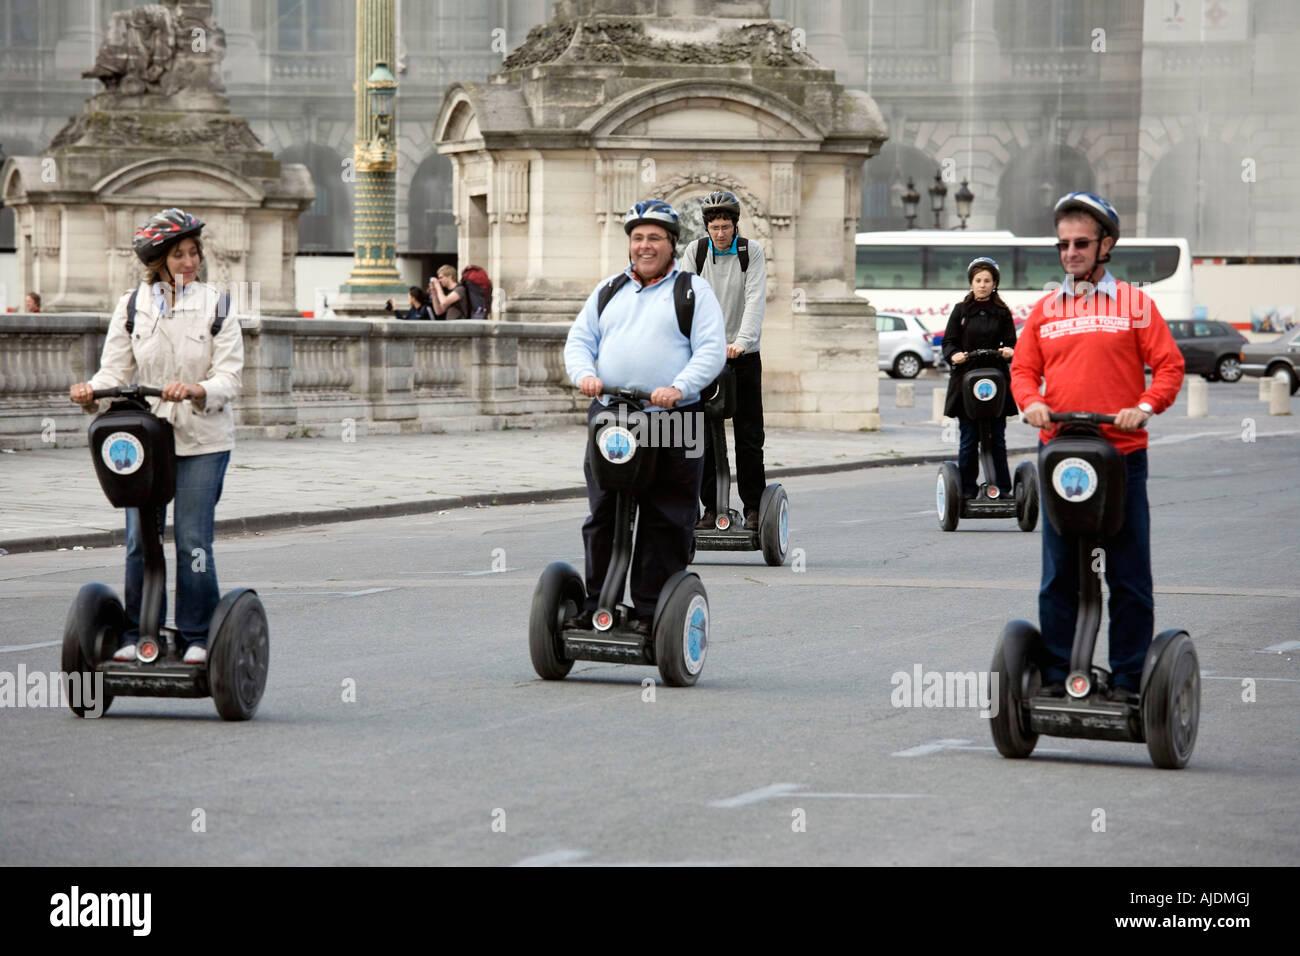 France Paris Tourists on Segway personal transporters in Place de la Concorde Stock Photo